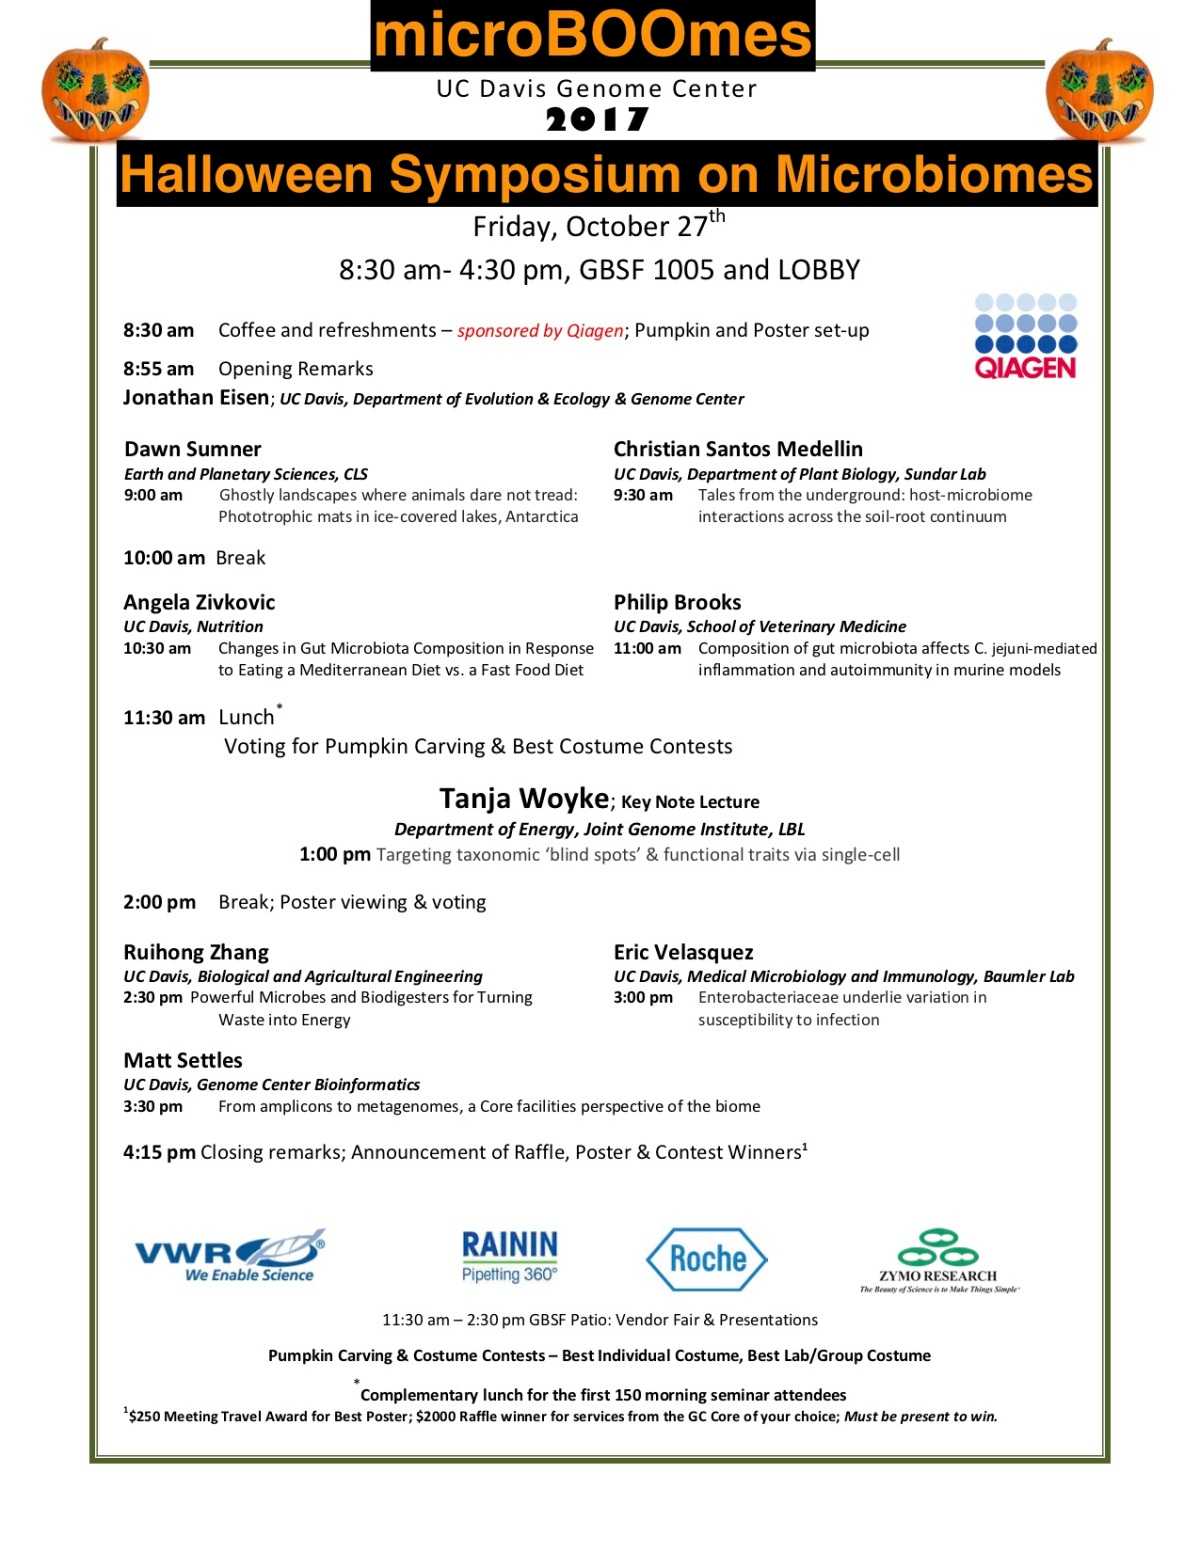 Genome Center Halloween Symposium 2020 10/27 – microBOOmes: UC Davis Genome Center Halloween Symposium on